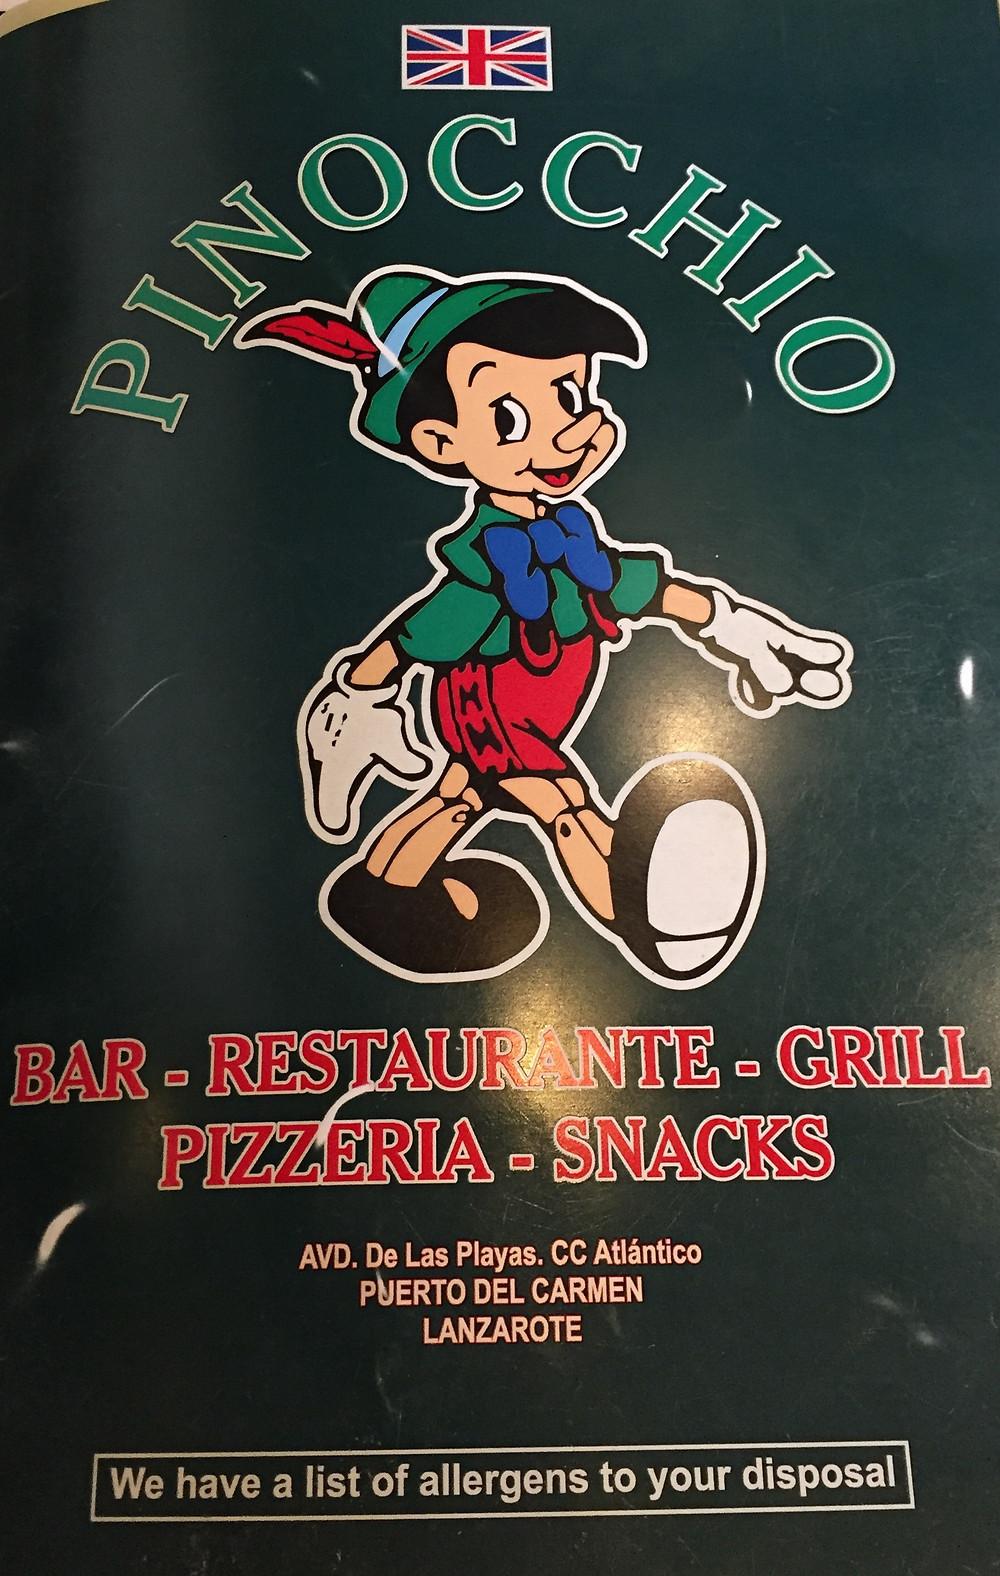 Pinocchio's restaurant Lanzarote